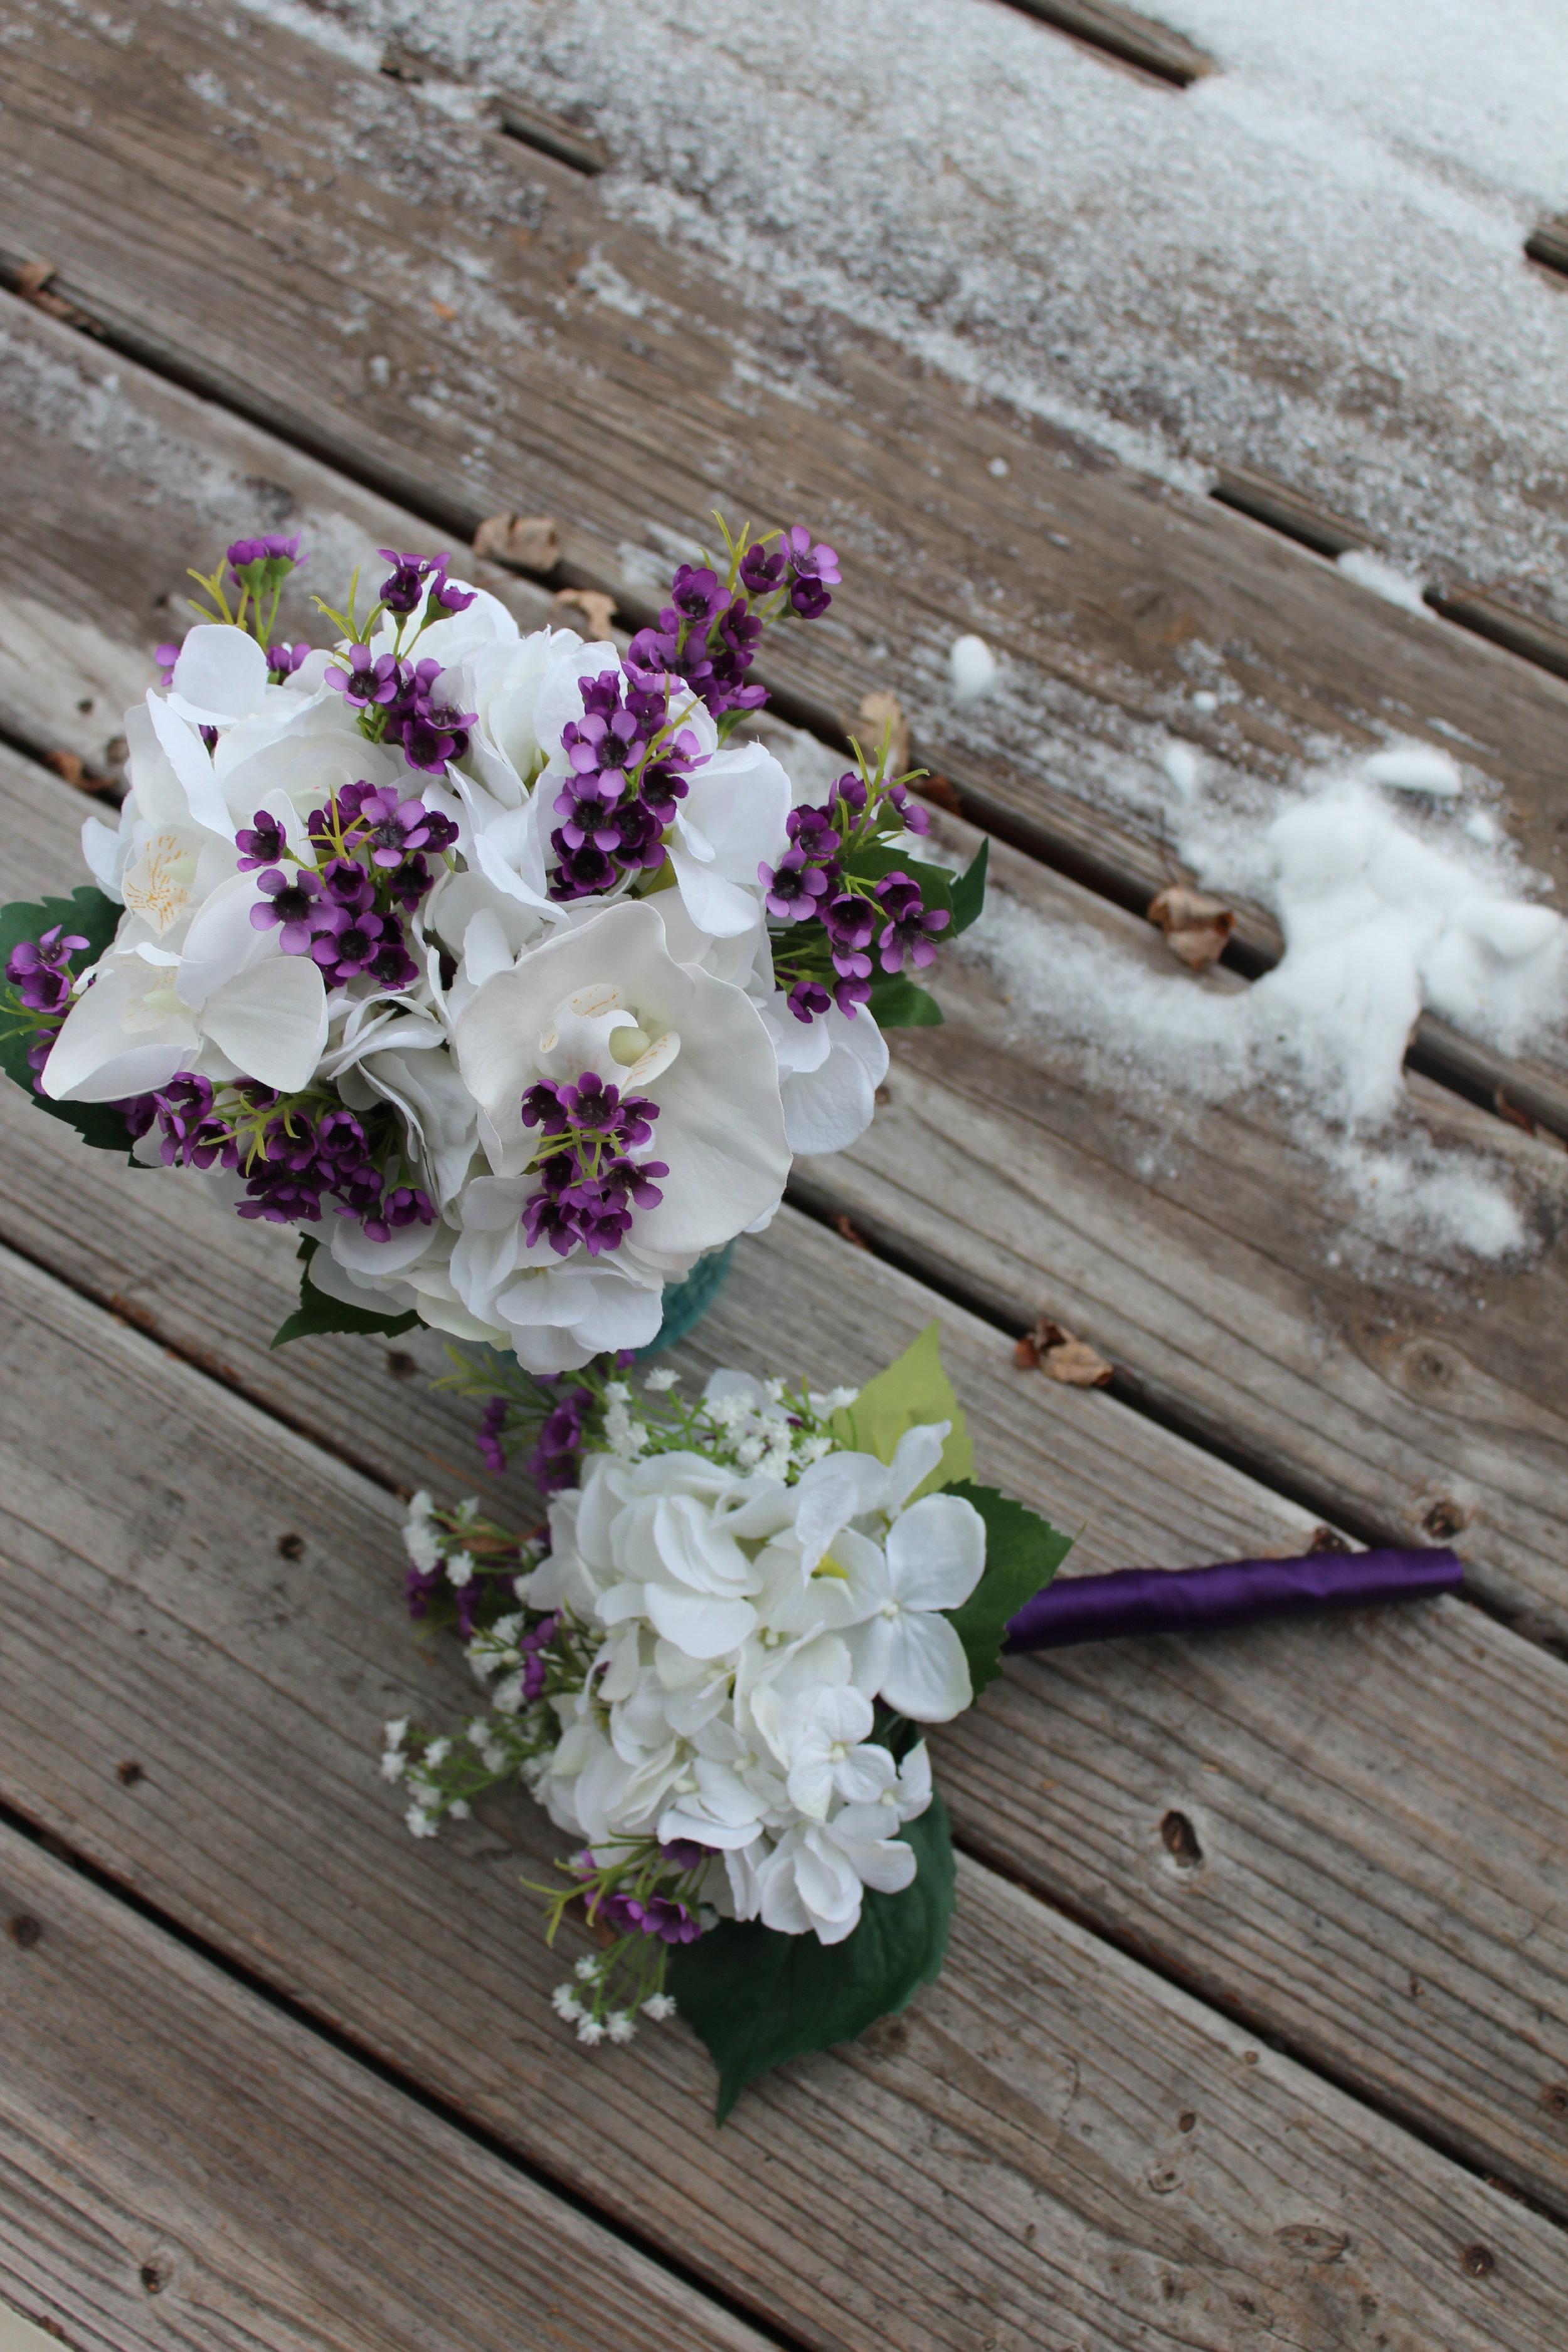 Bridesmaid Bouquet: Hydrangea, Waxflower. Toss Bouquet: Hydrangea, Waxflower, Baby's Breath.